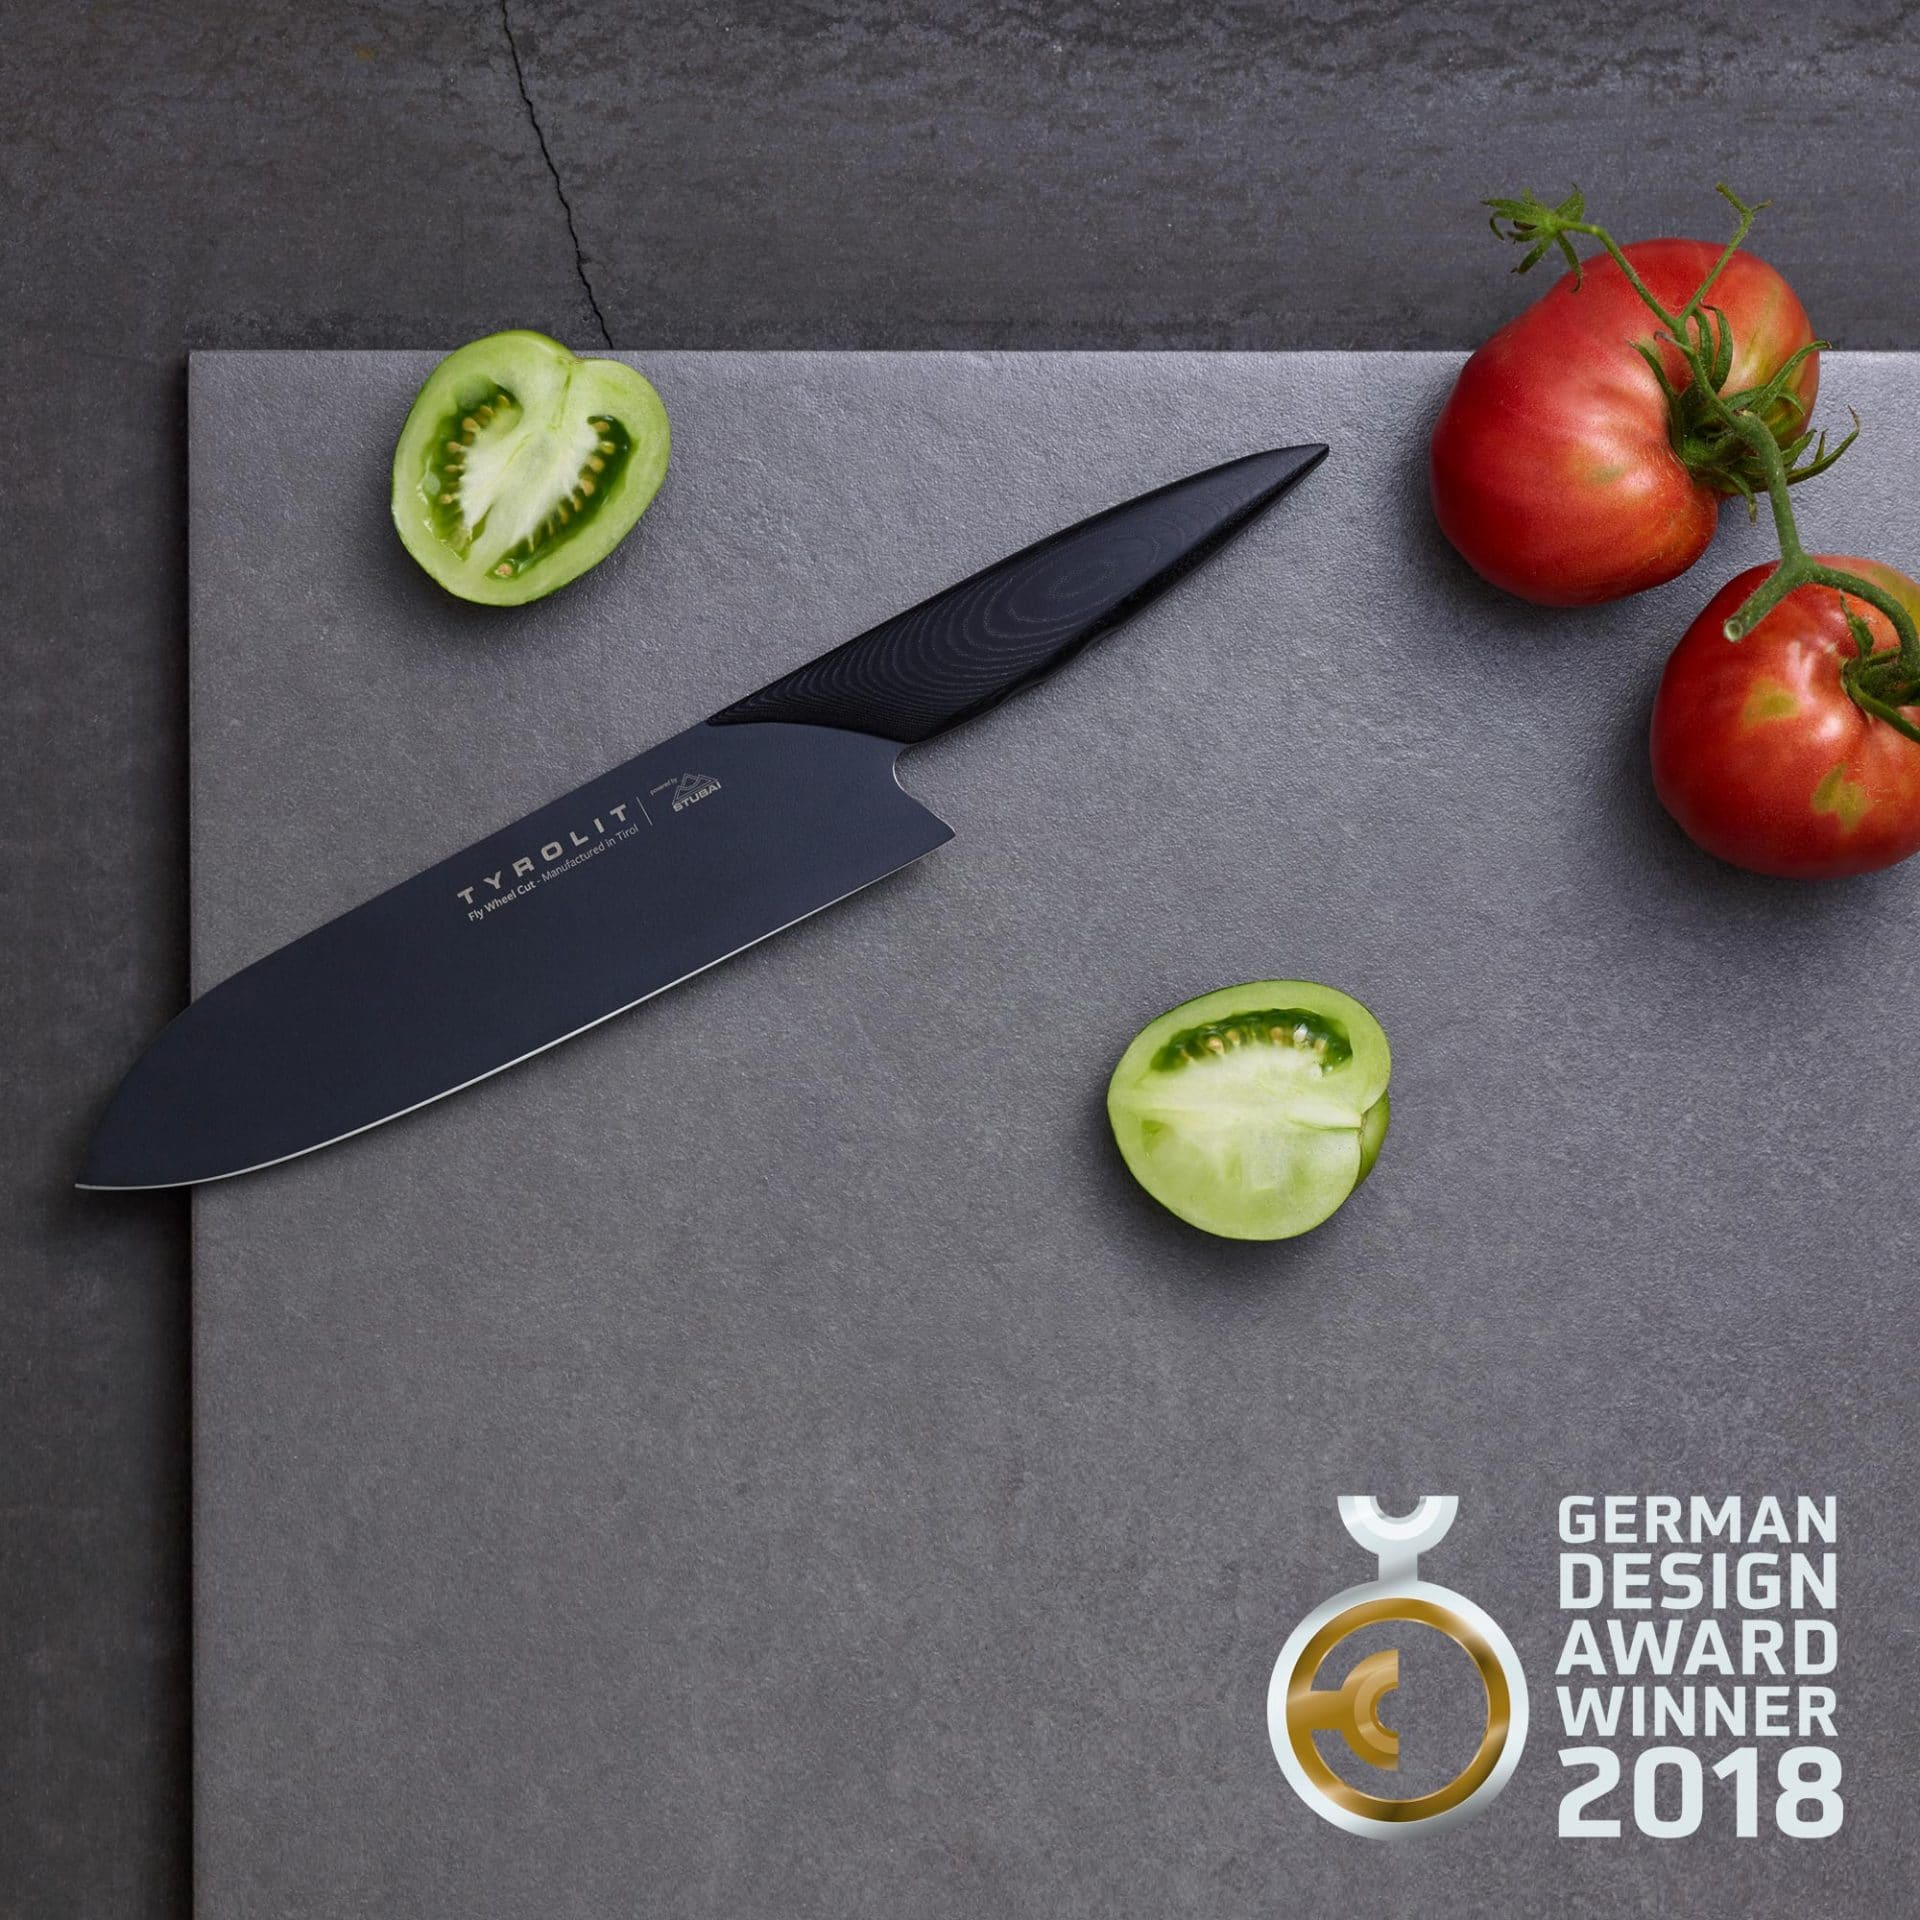 TYROLIT life Fly Wheel Cut Messer German Design Award